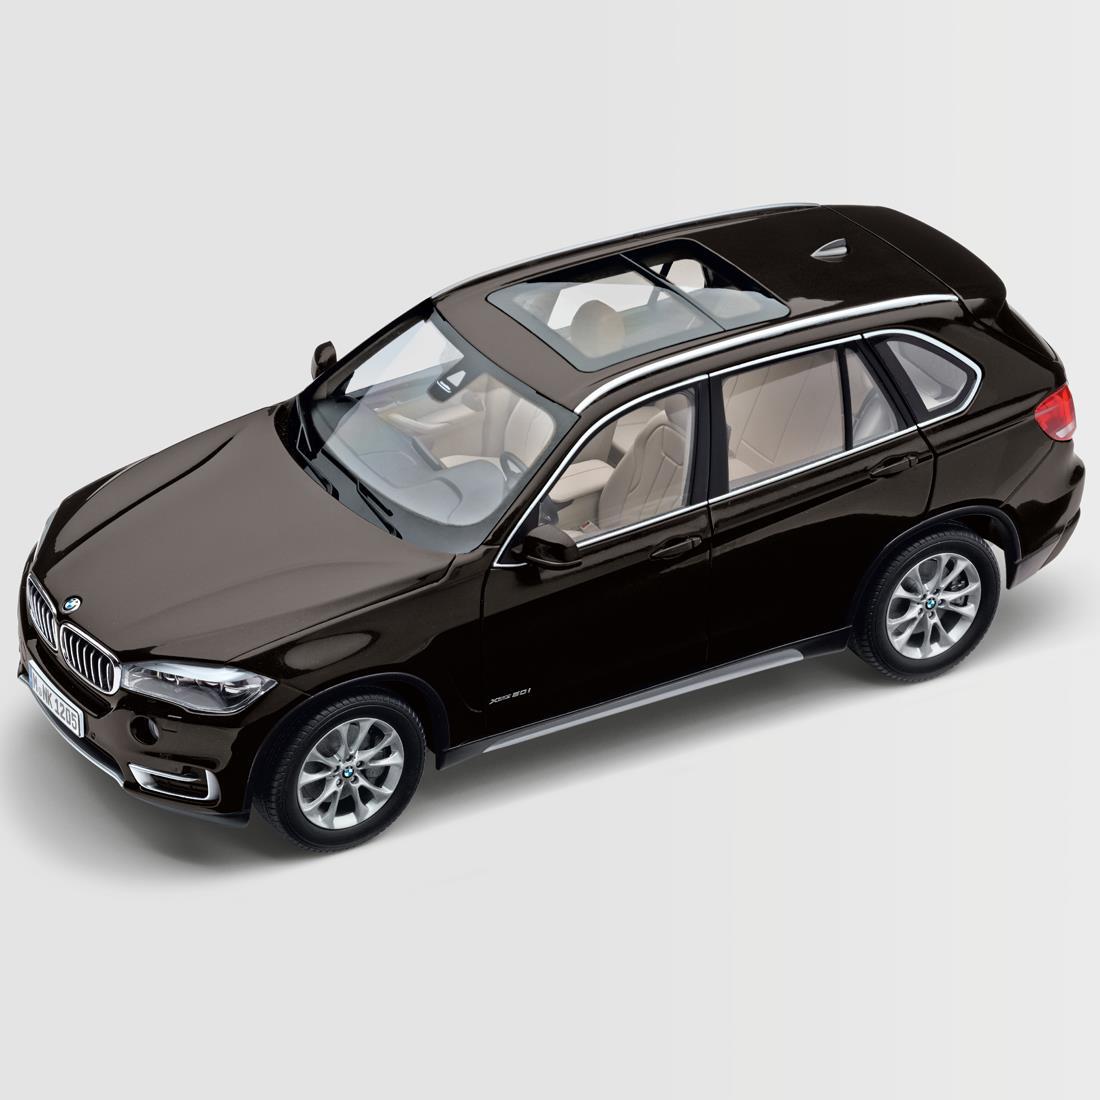 ShopBMWUSA.com: BMW X5 MODEL 1:43